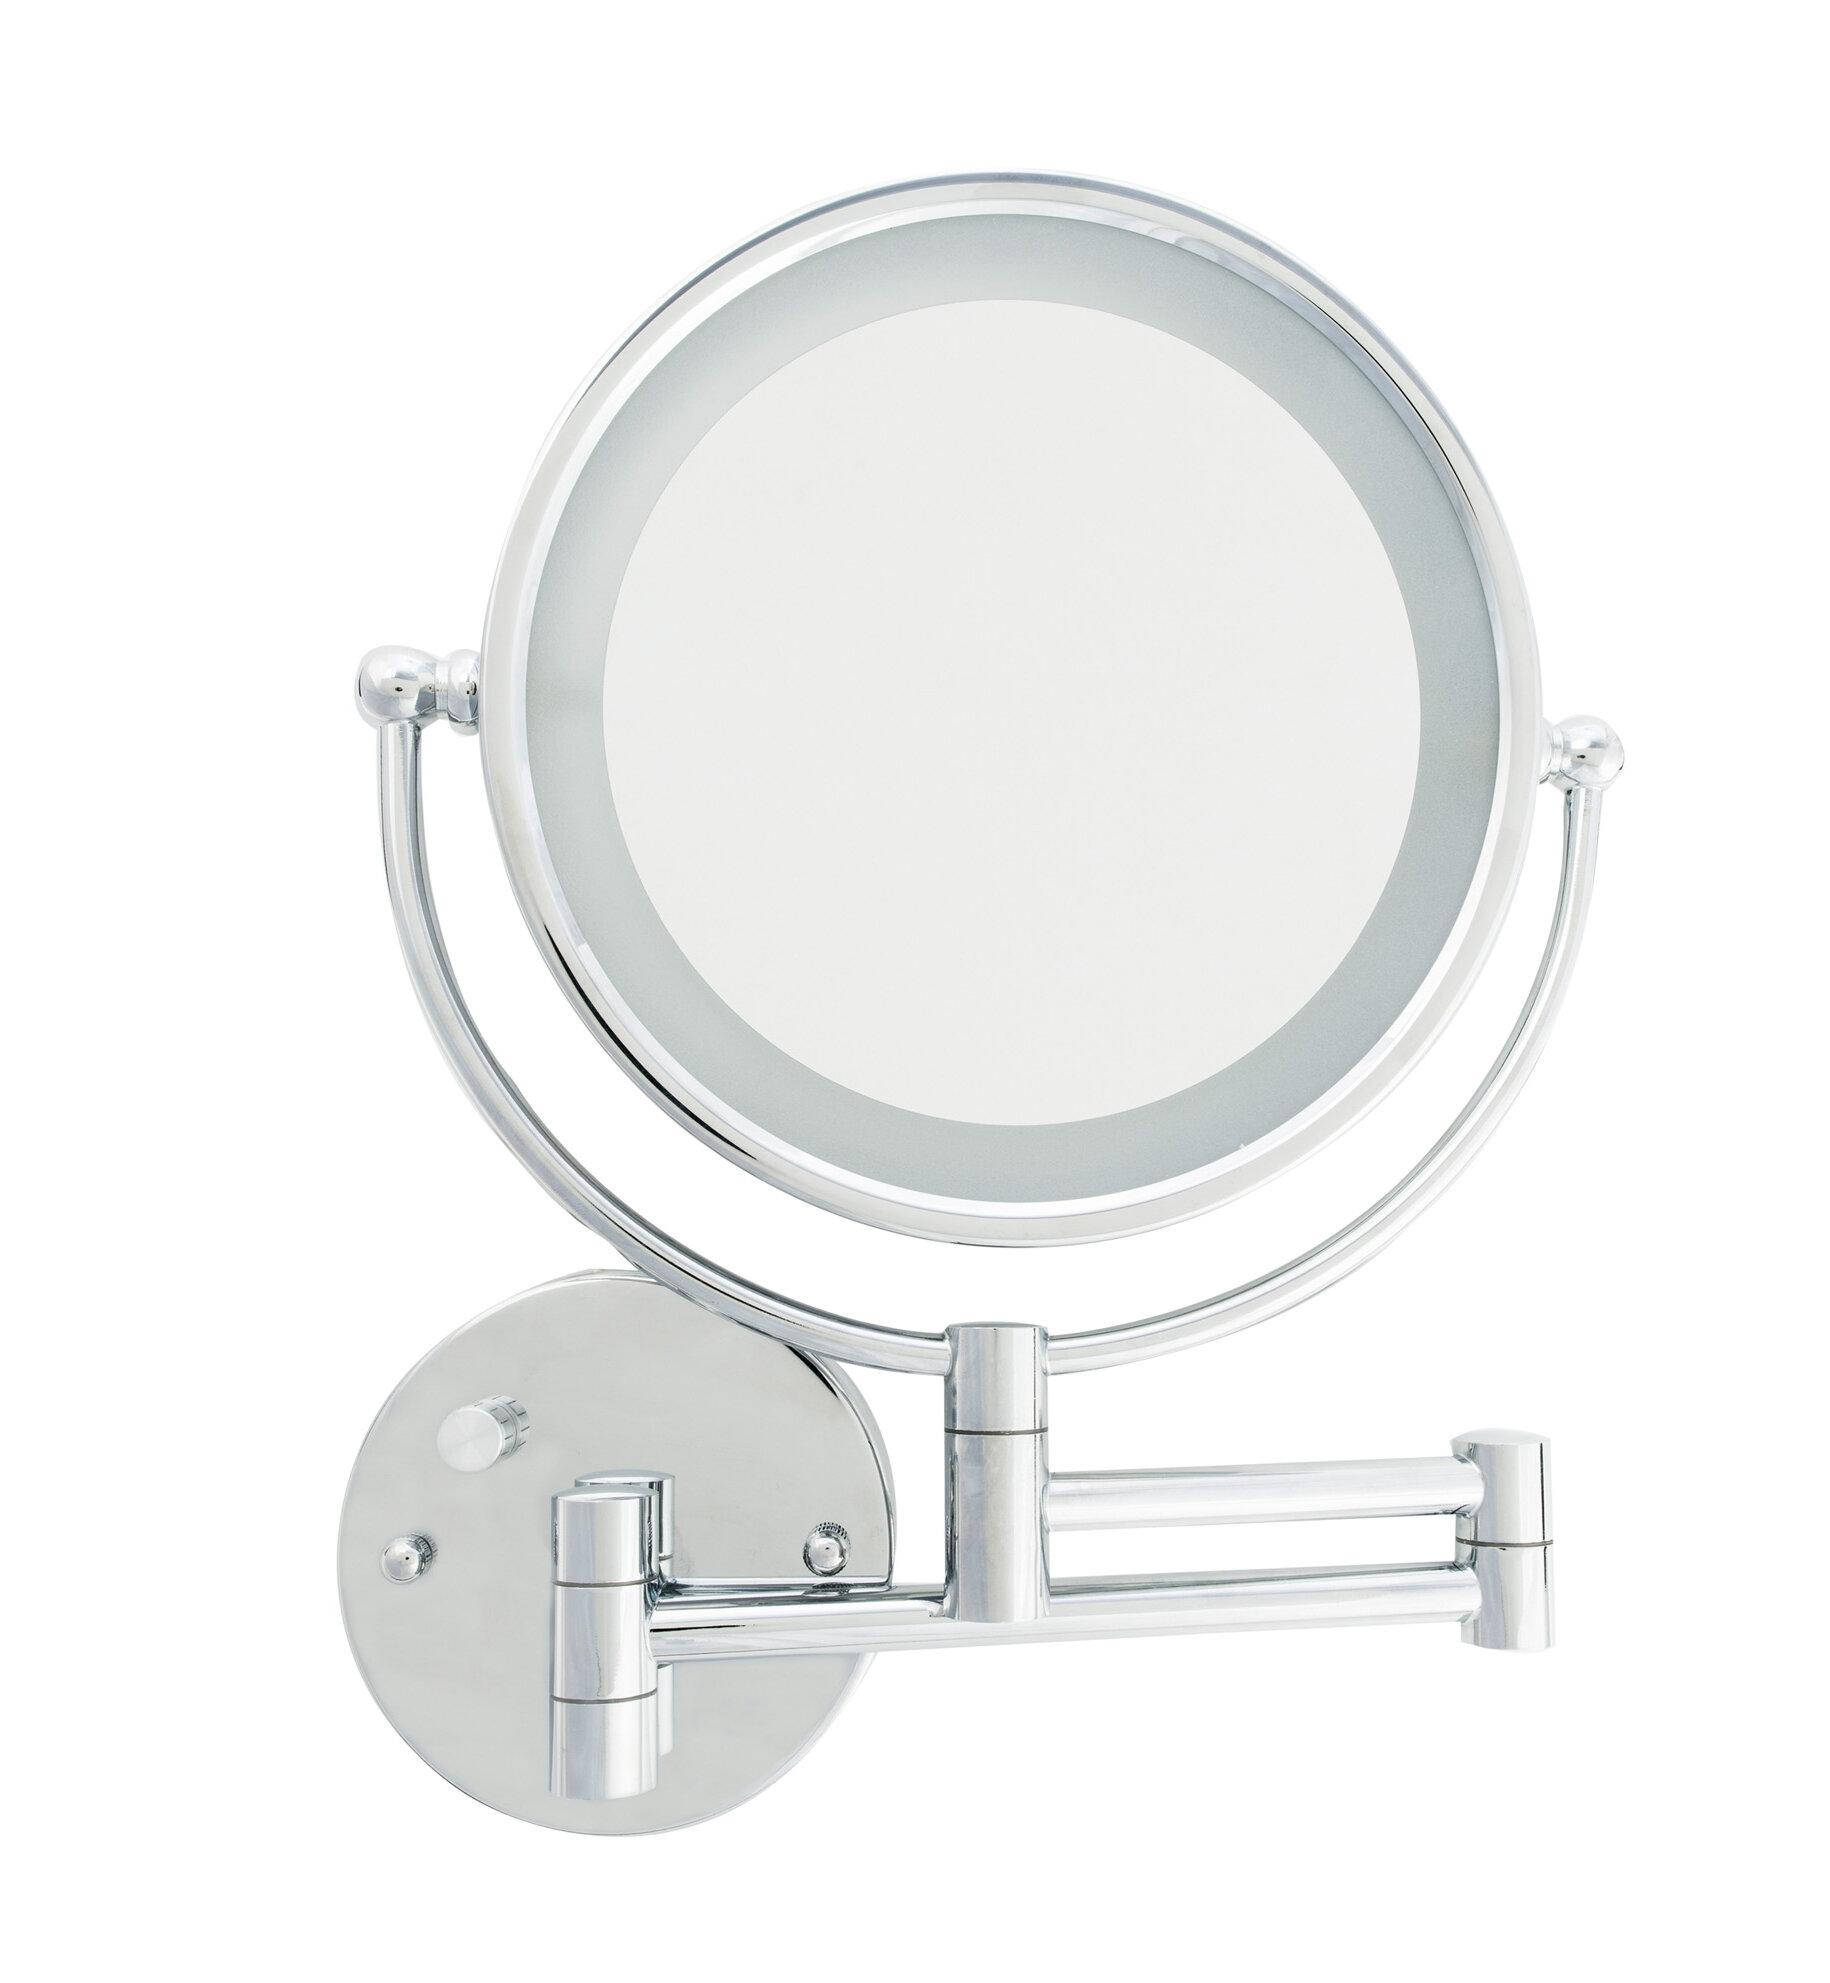 Danielle Creations Led Wall Mount Makeup Shaving Mirror Wayfair Jerdon Mounted Wiring Diagram